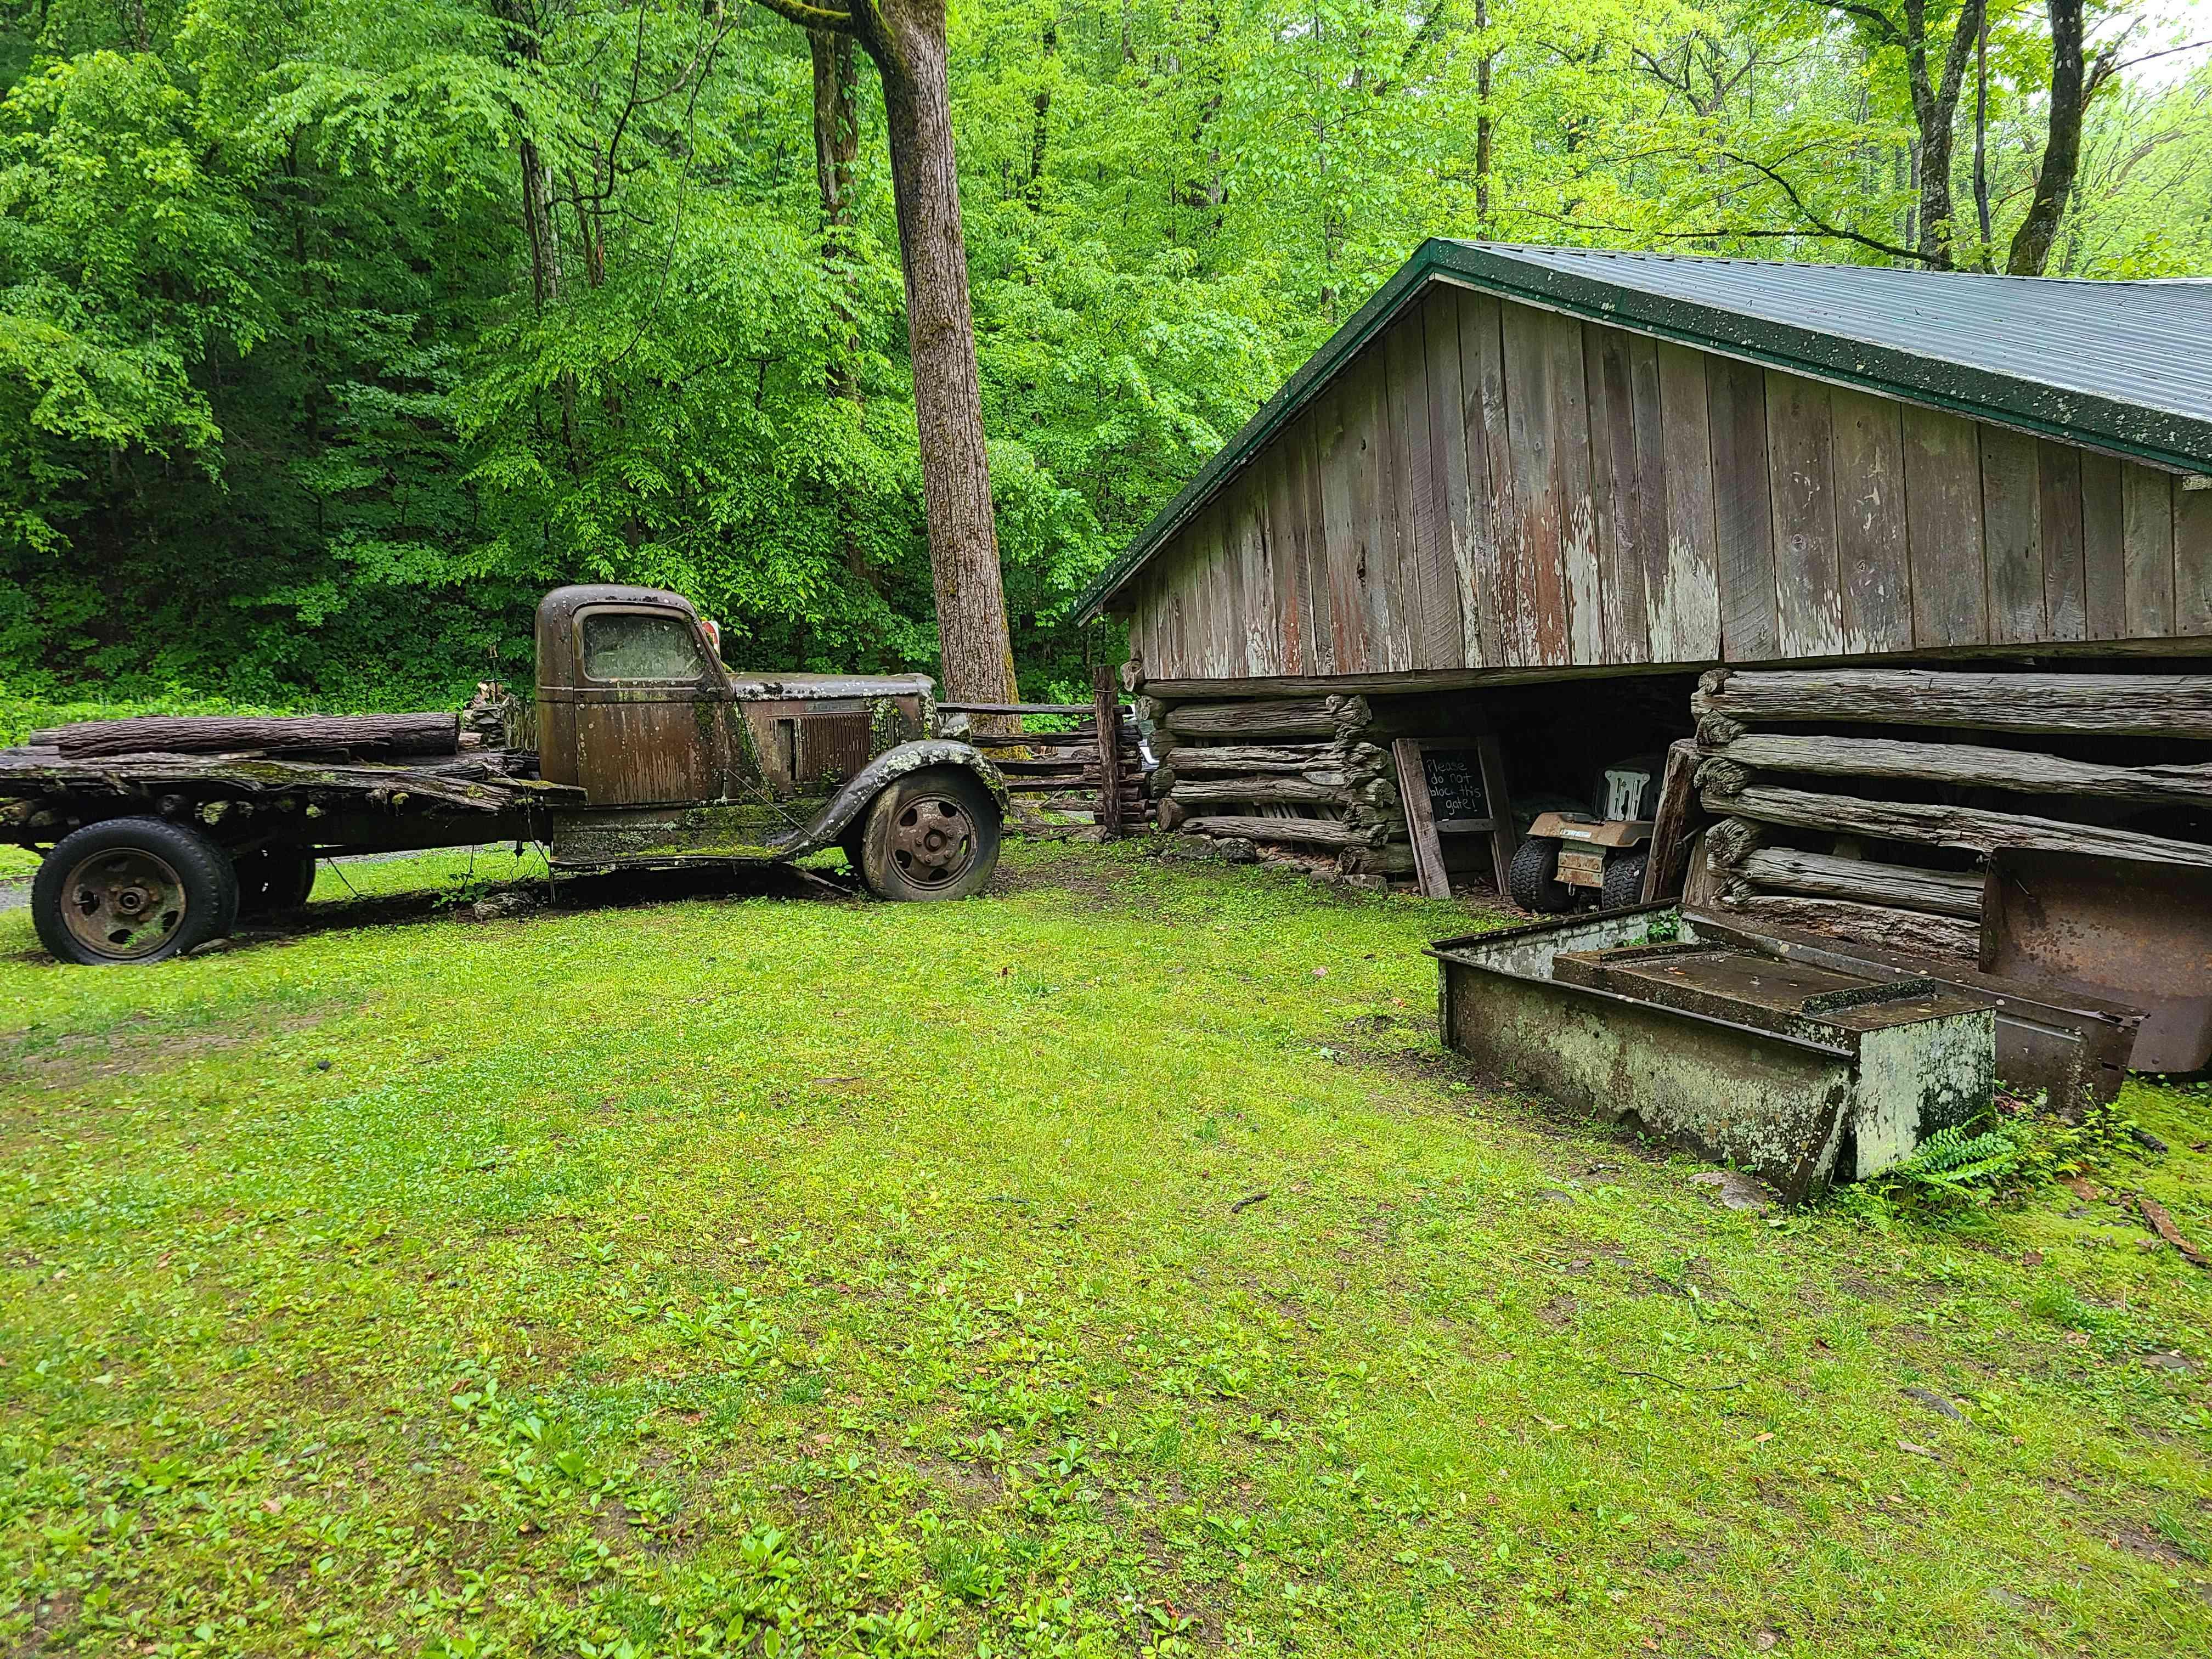 Appalachian scene at Ely's Mill near Gatlinburg, Tennessee